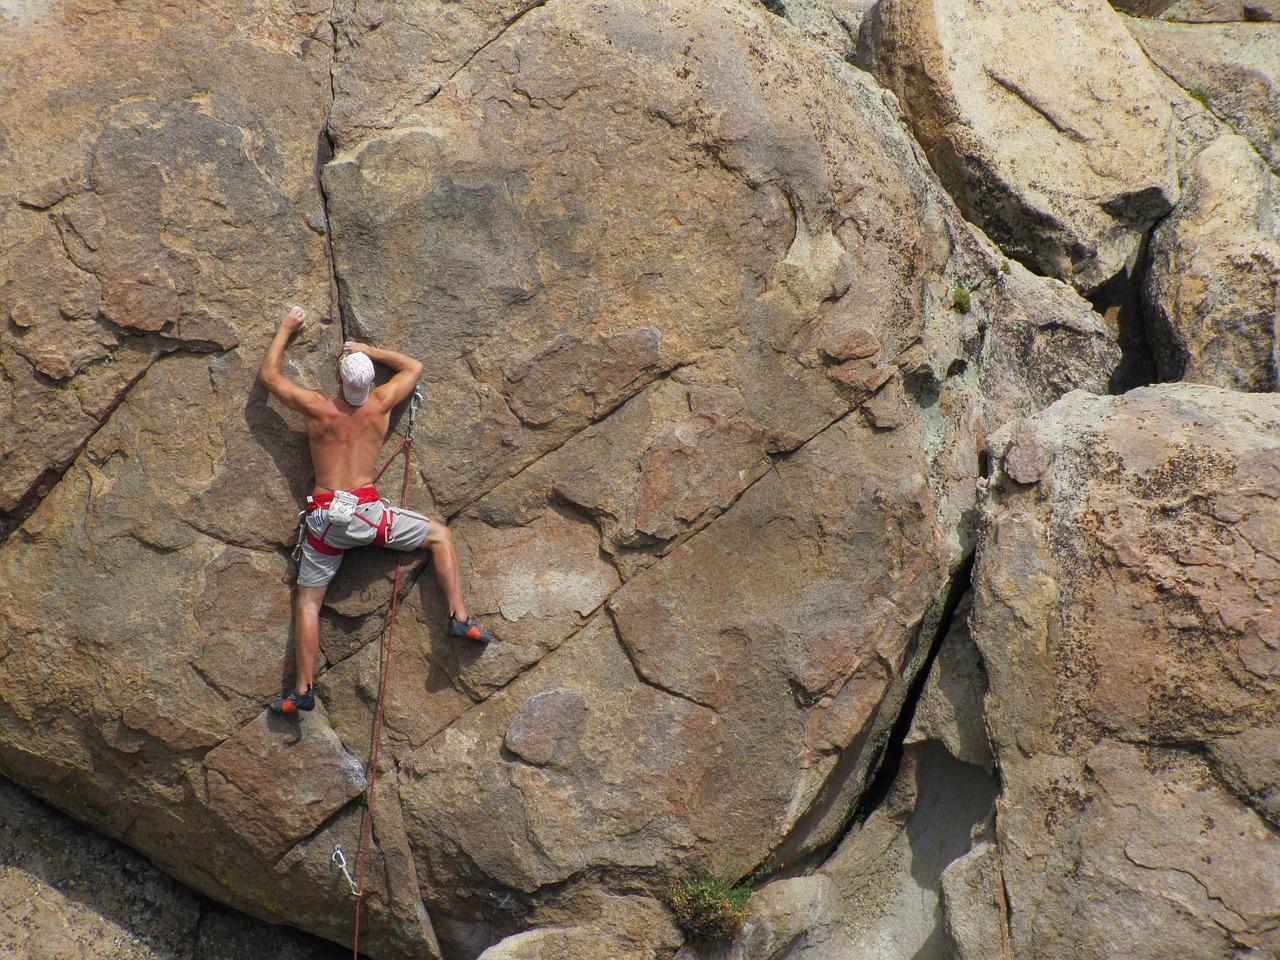 Rock climbing 403478 1280